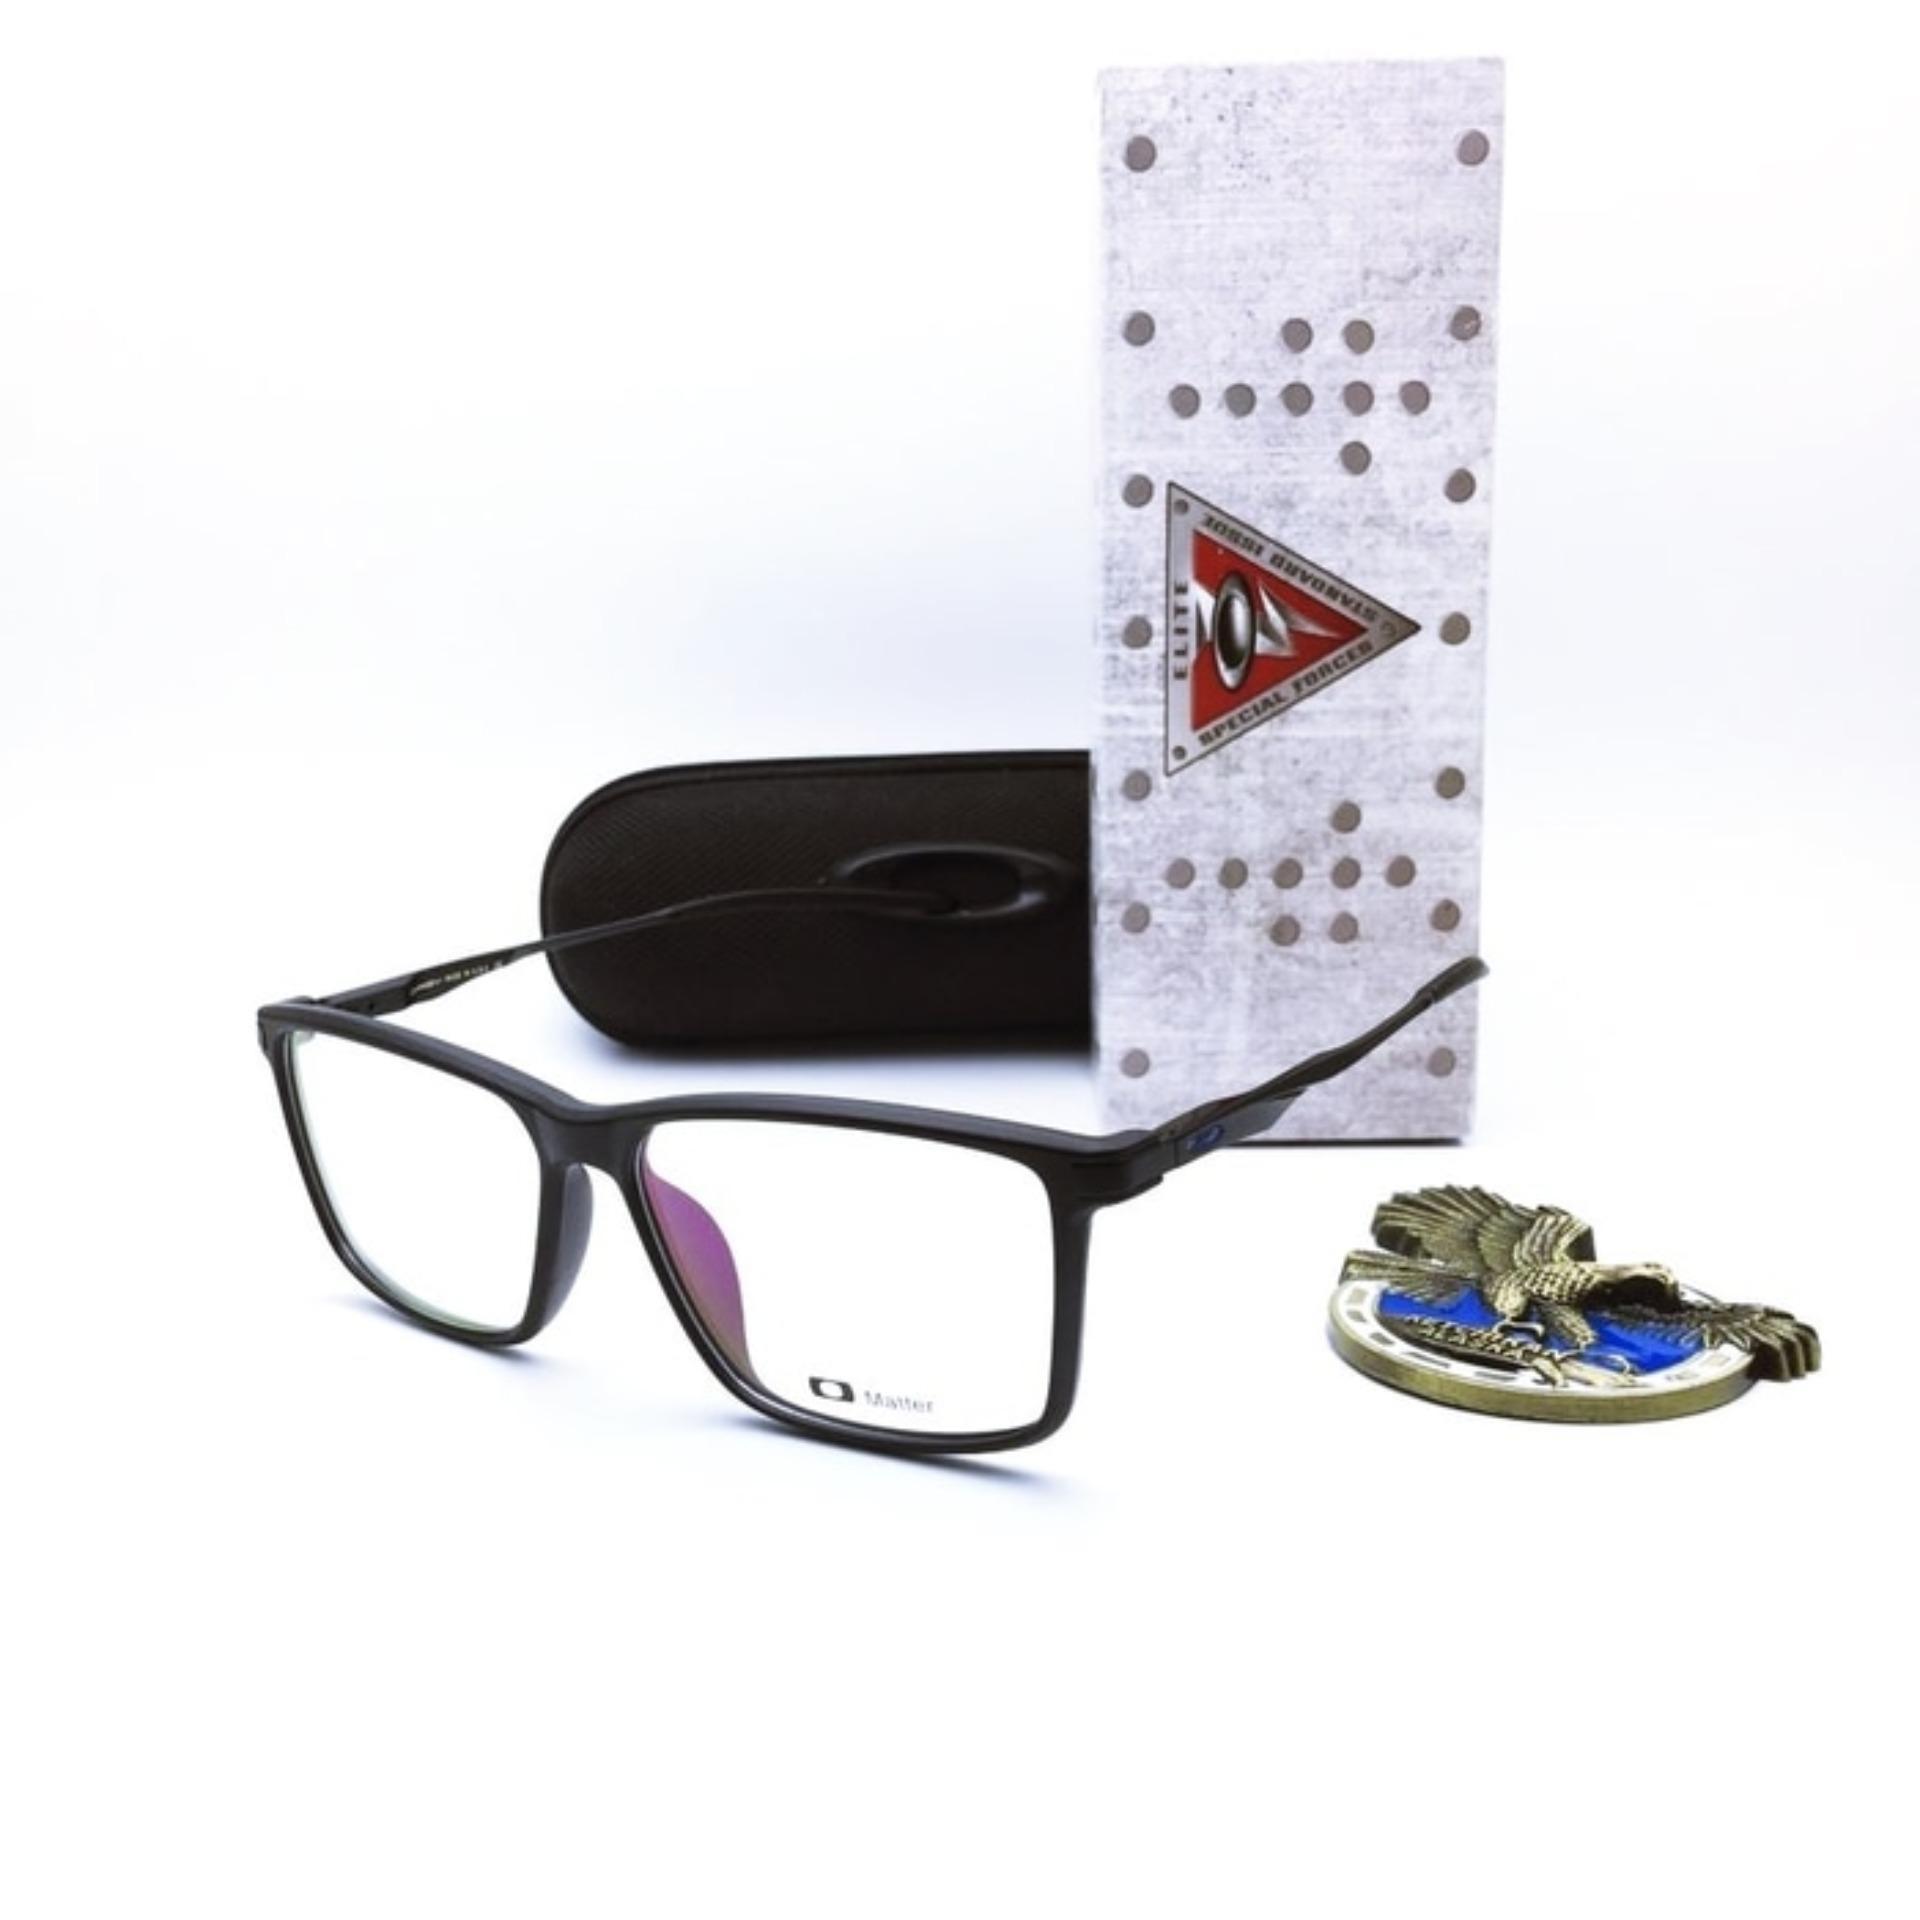 Paket Photochromic Kacamata R-1084 Okley Lensa Anti Radiasi Minus sampai 5.50 , Cylinder Di atas 2